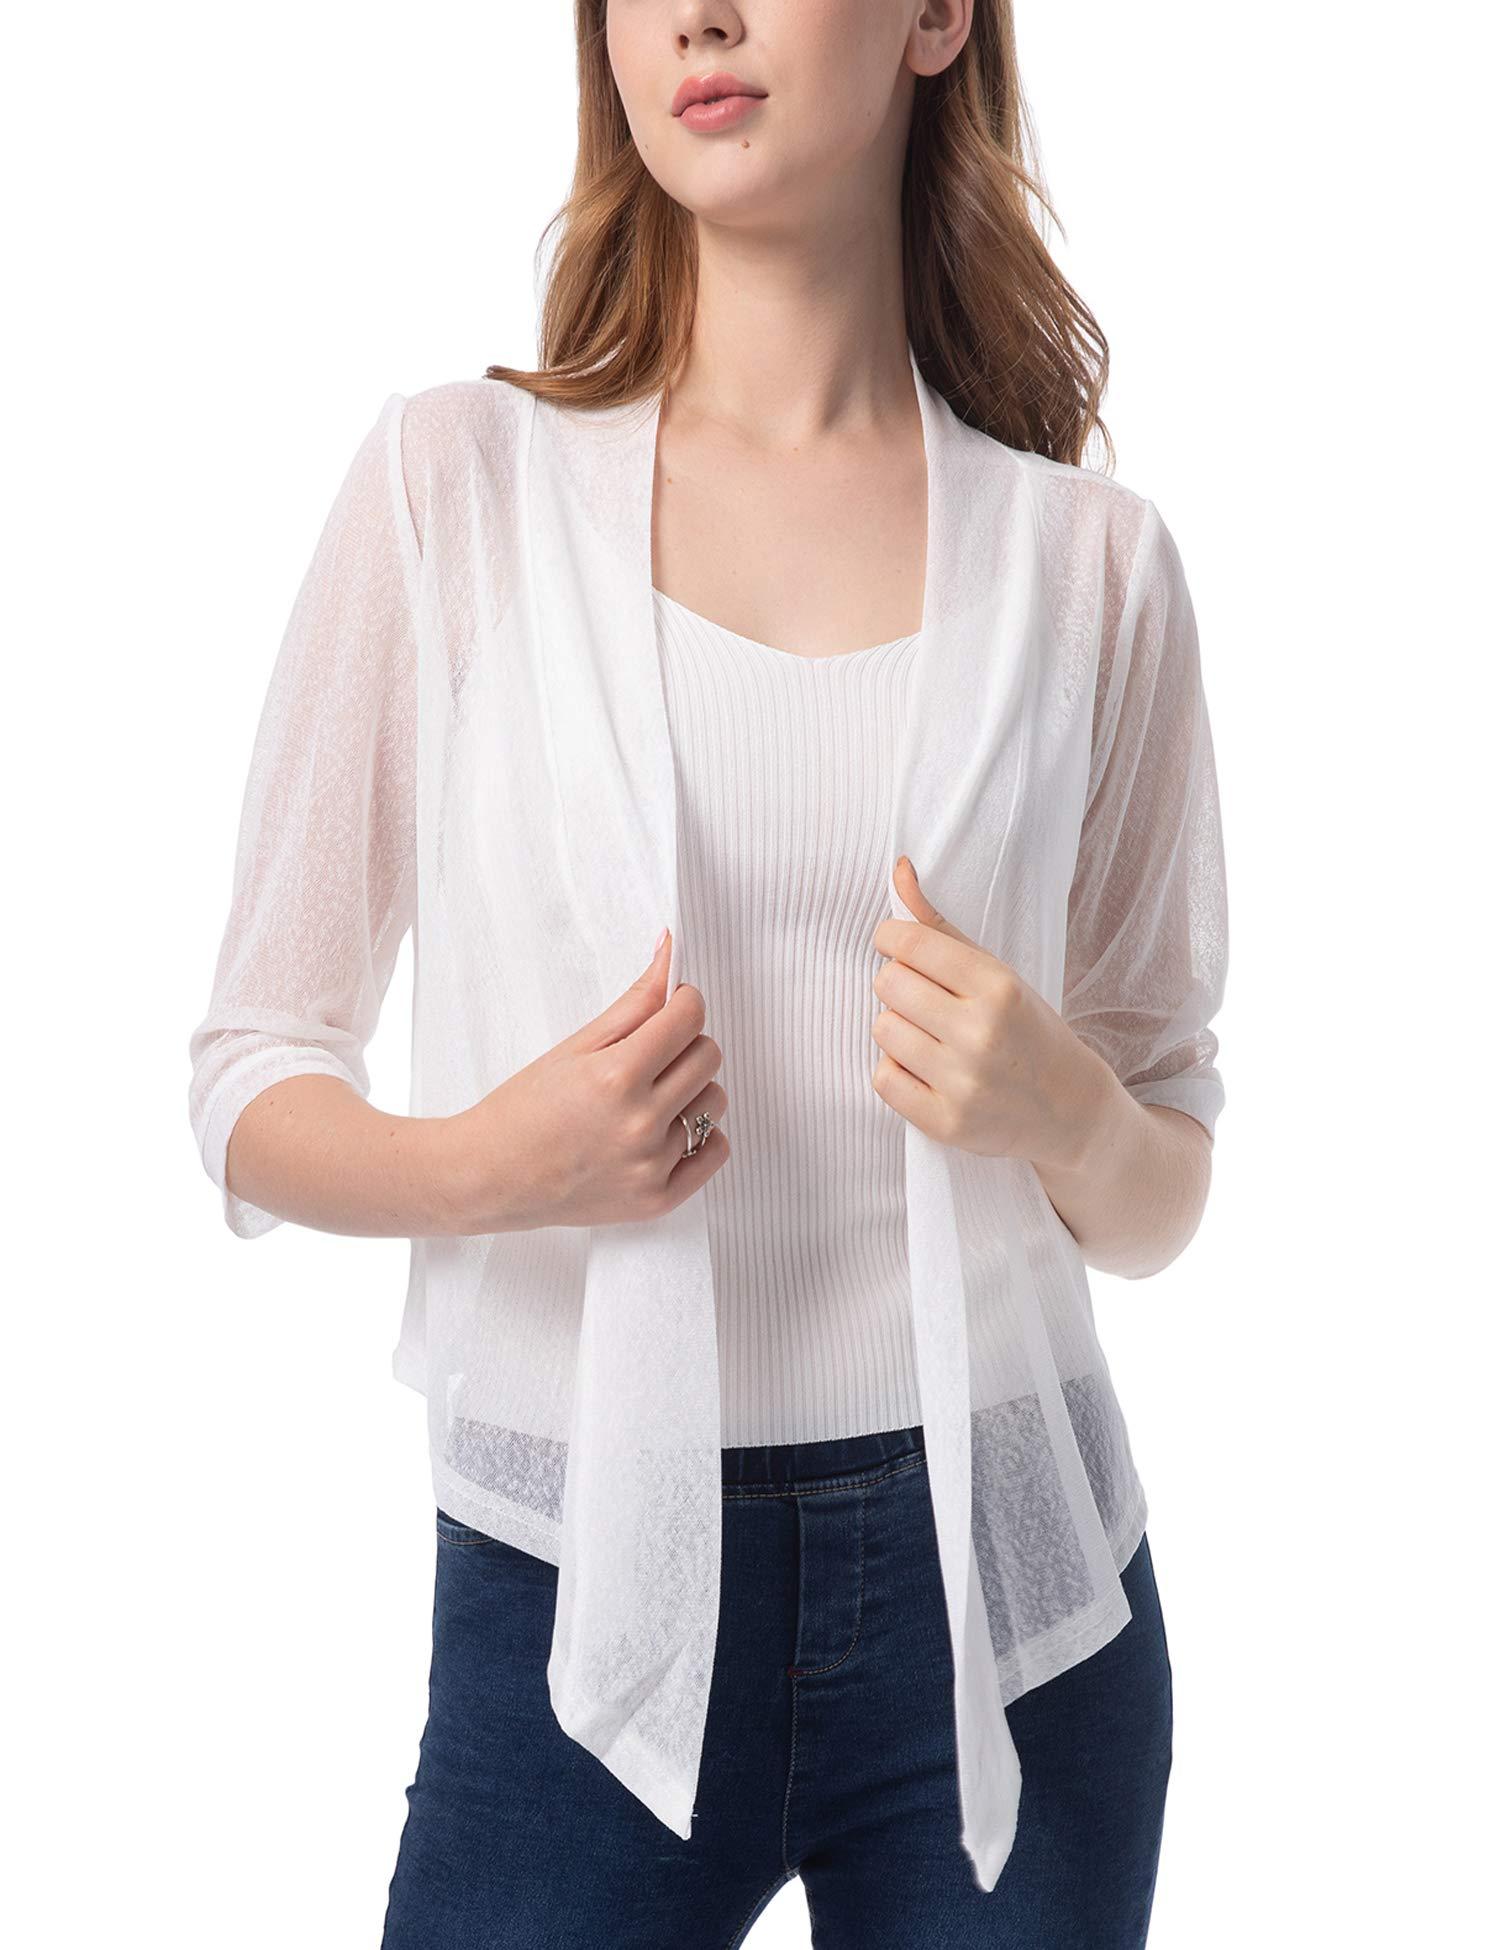 423c4667776945 Women's Tie Front 3/4 Sleeve Shrug Sheer Wrap Cropped Bolero Top Thin  Cardigan product